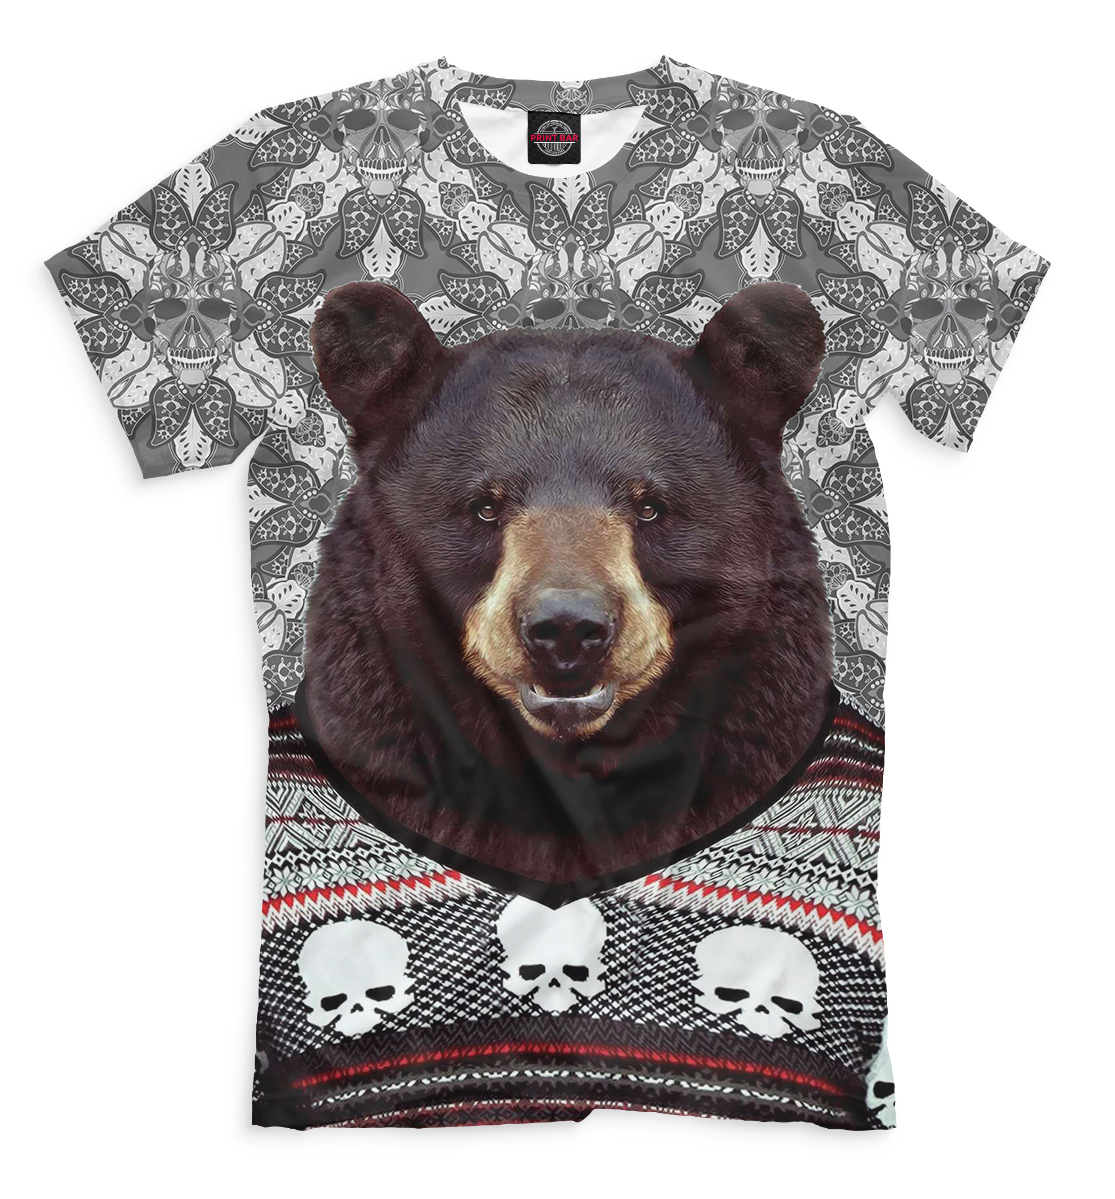 Картинки медведя в свитере